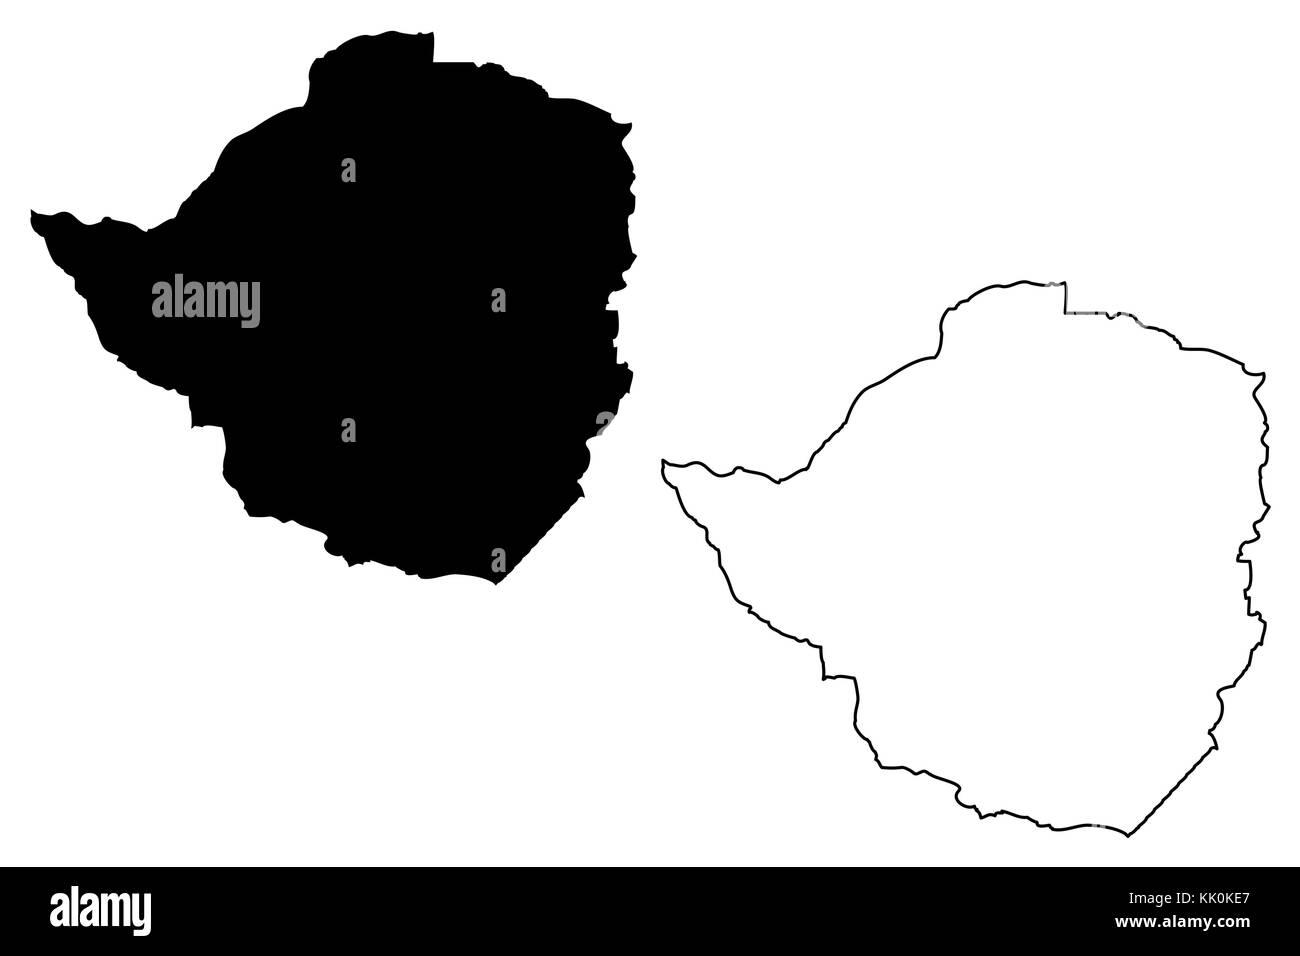 Zimbabwe Map Vector Illustration Scribble Sketch Republic Of - Republic of zimbabwe map